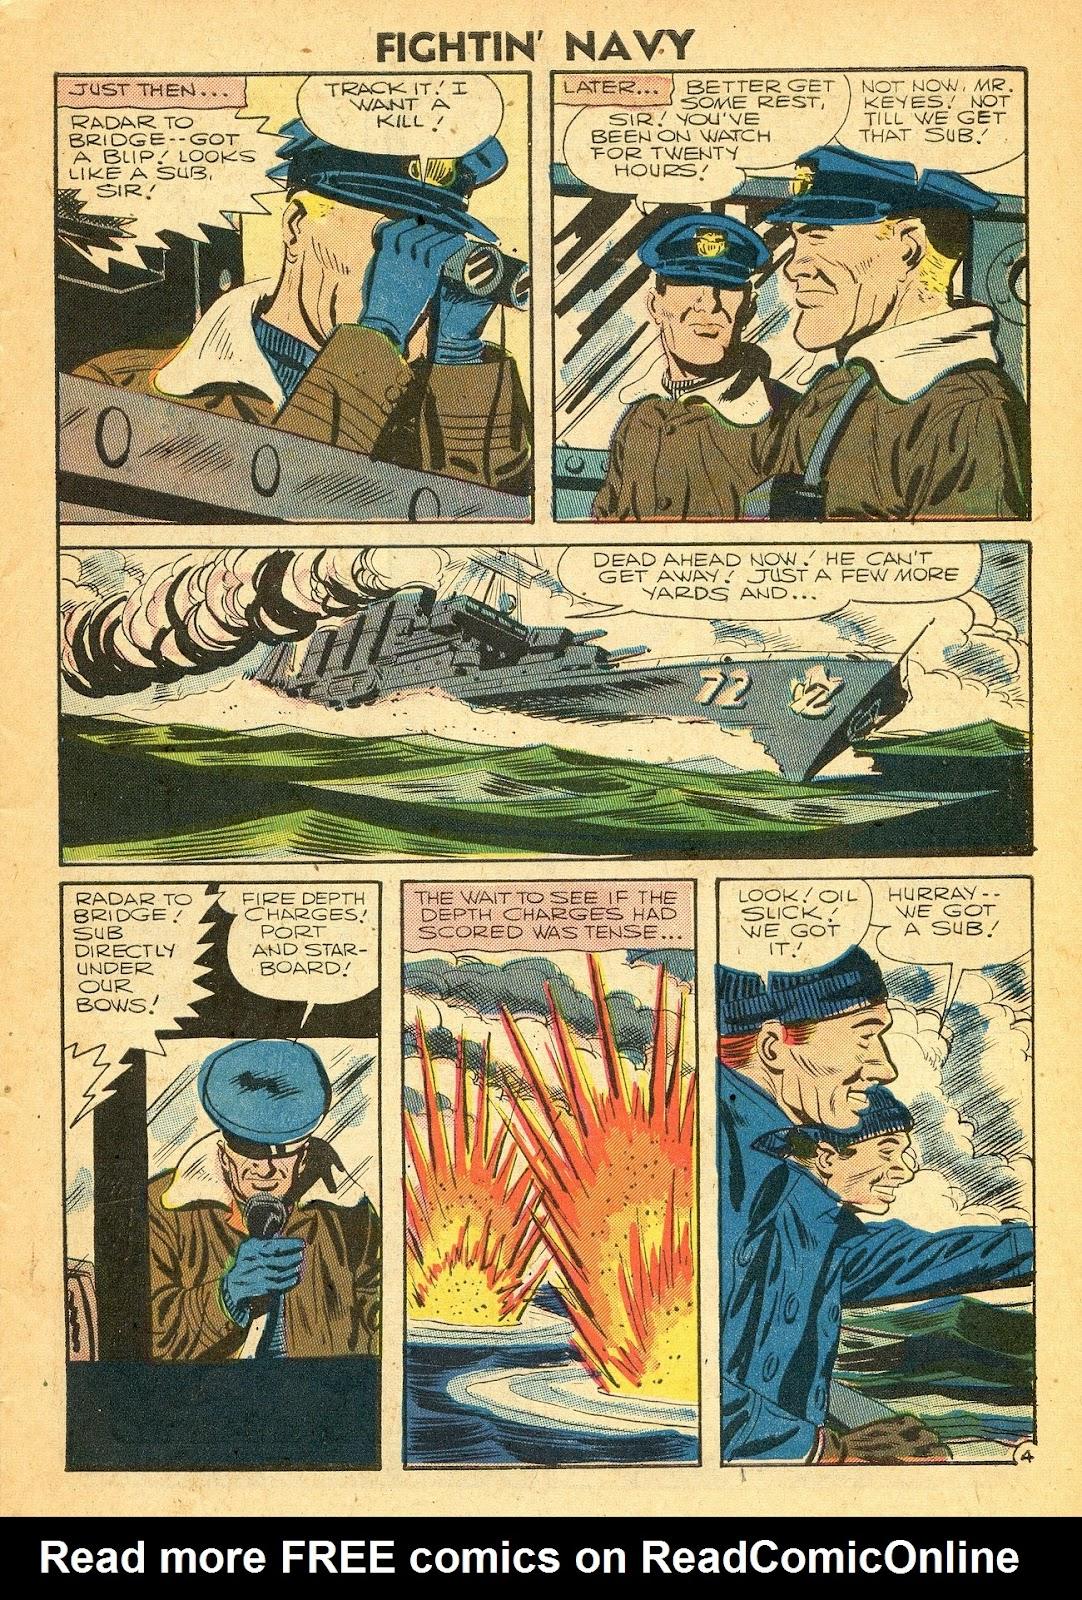 Read online Fightin' Navy comic -  Issue #77 - 7